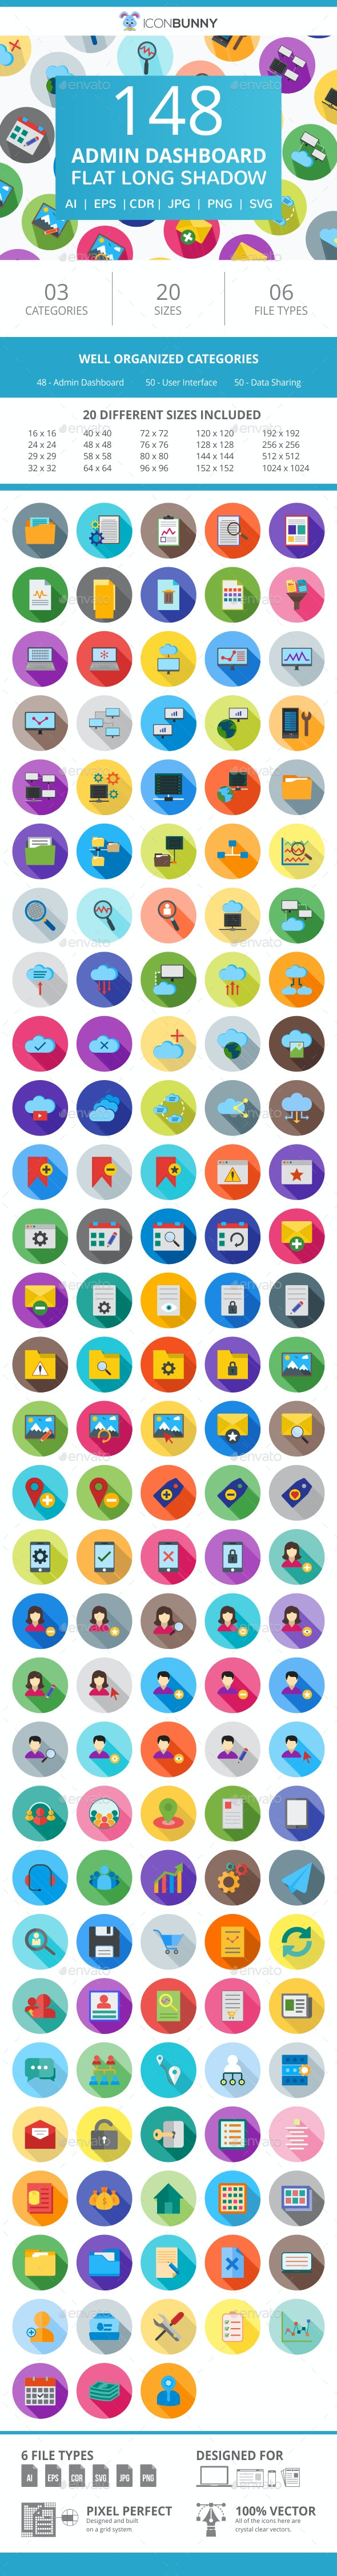 148 Admin Dashboard Flat Long Shadow Icons - Icons